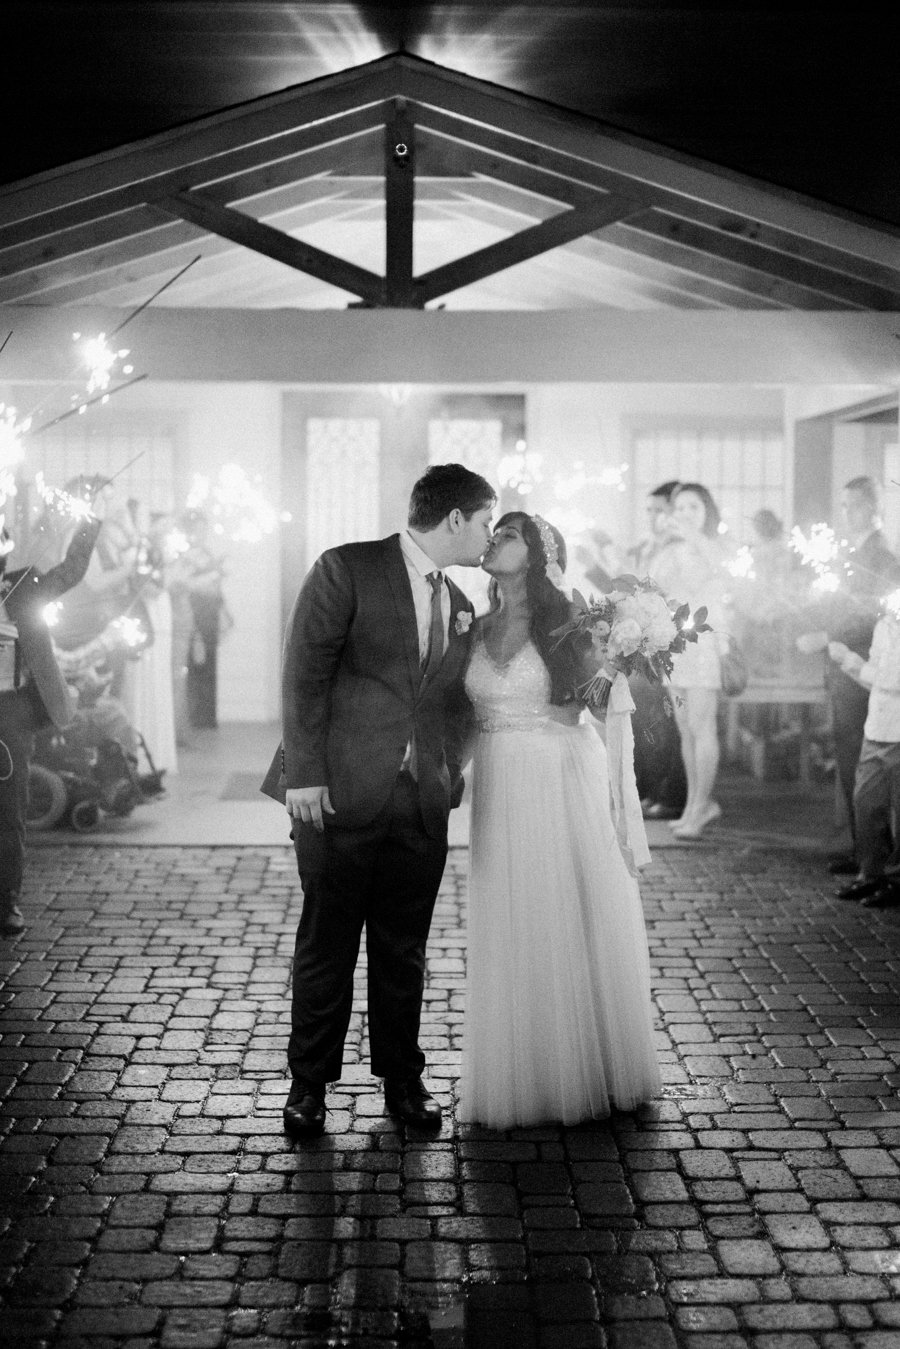 Dana Fernandez Photography Houston Texas Destination Photographer Film Ruffled Blog Wedding Bridal First Look Featured Photography -30.jpg